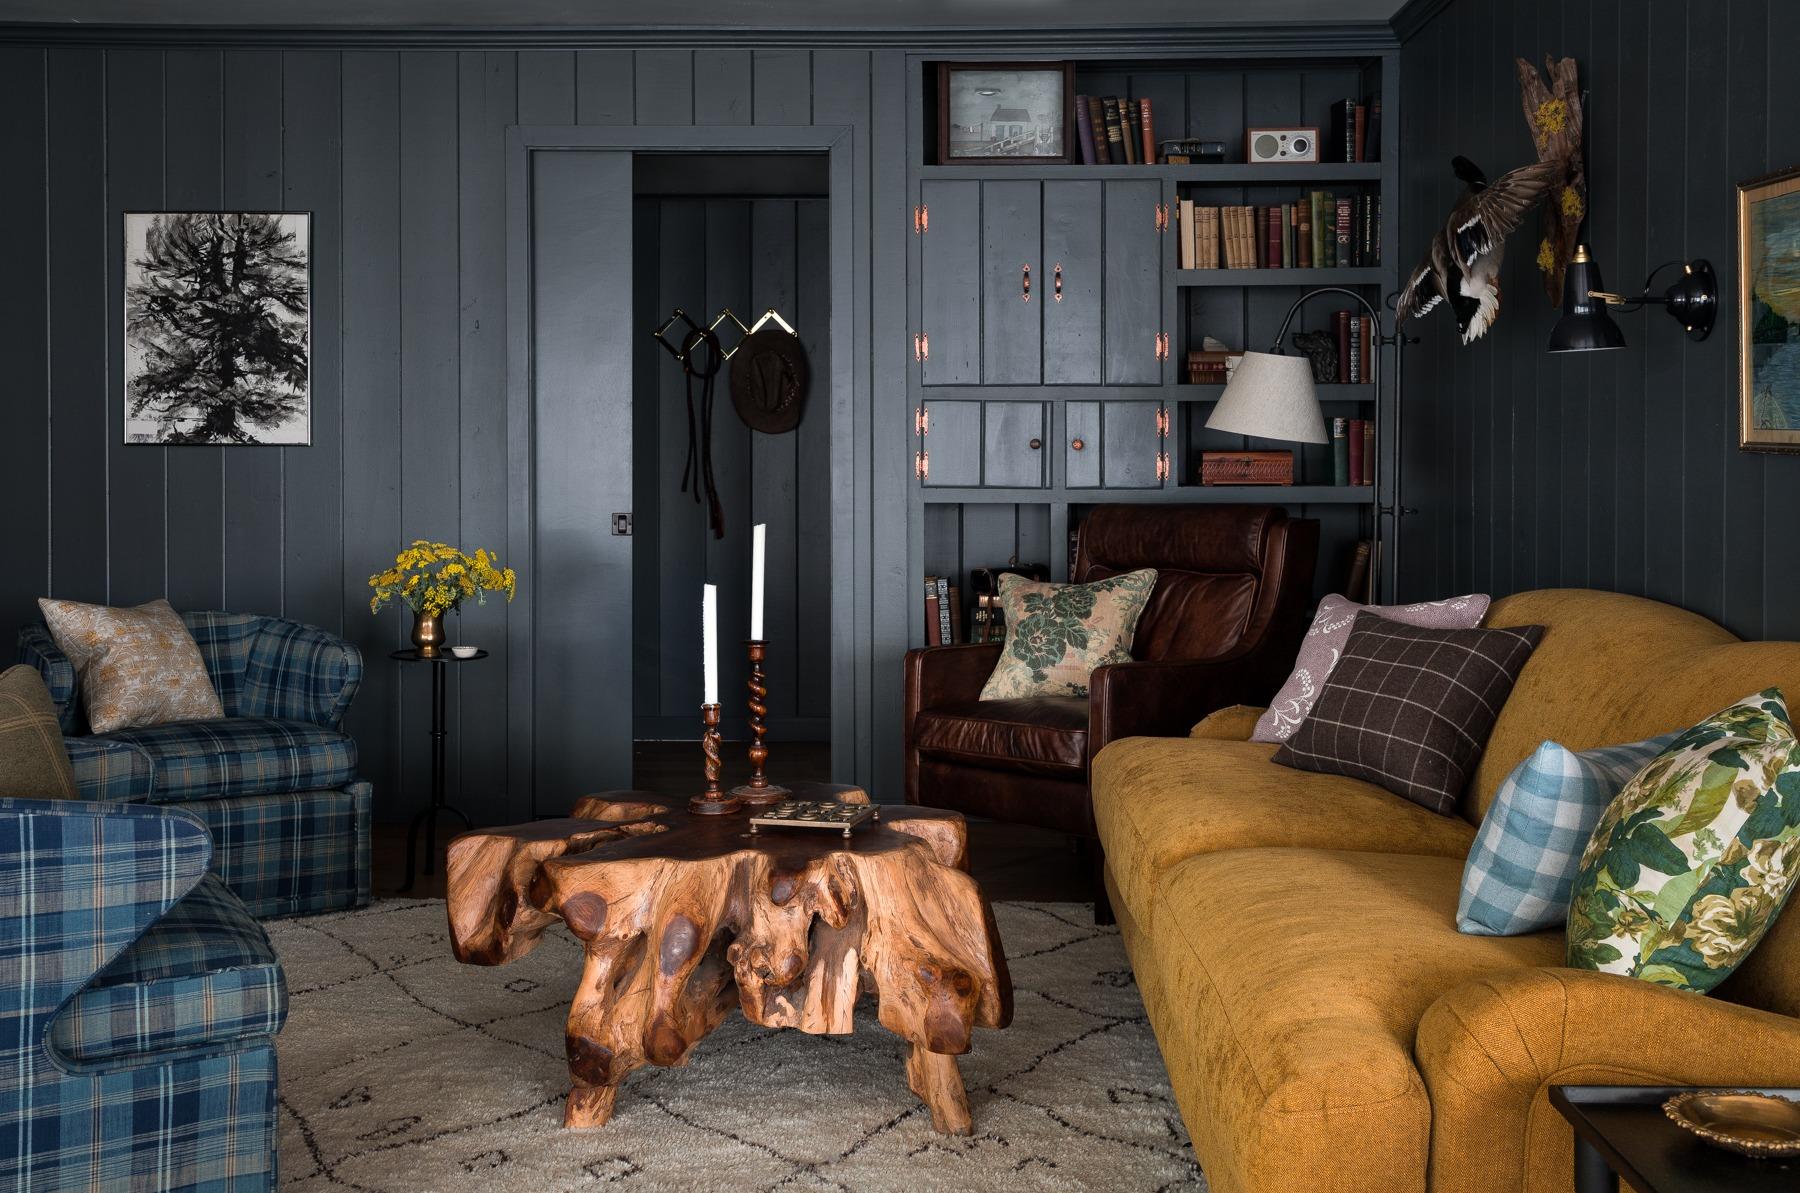 Heidi Caillier Design Seattle Interior Designer The Cabin And The Snug Modern Traditional Dark Walls Living Room Heidi Caillier